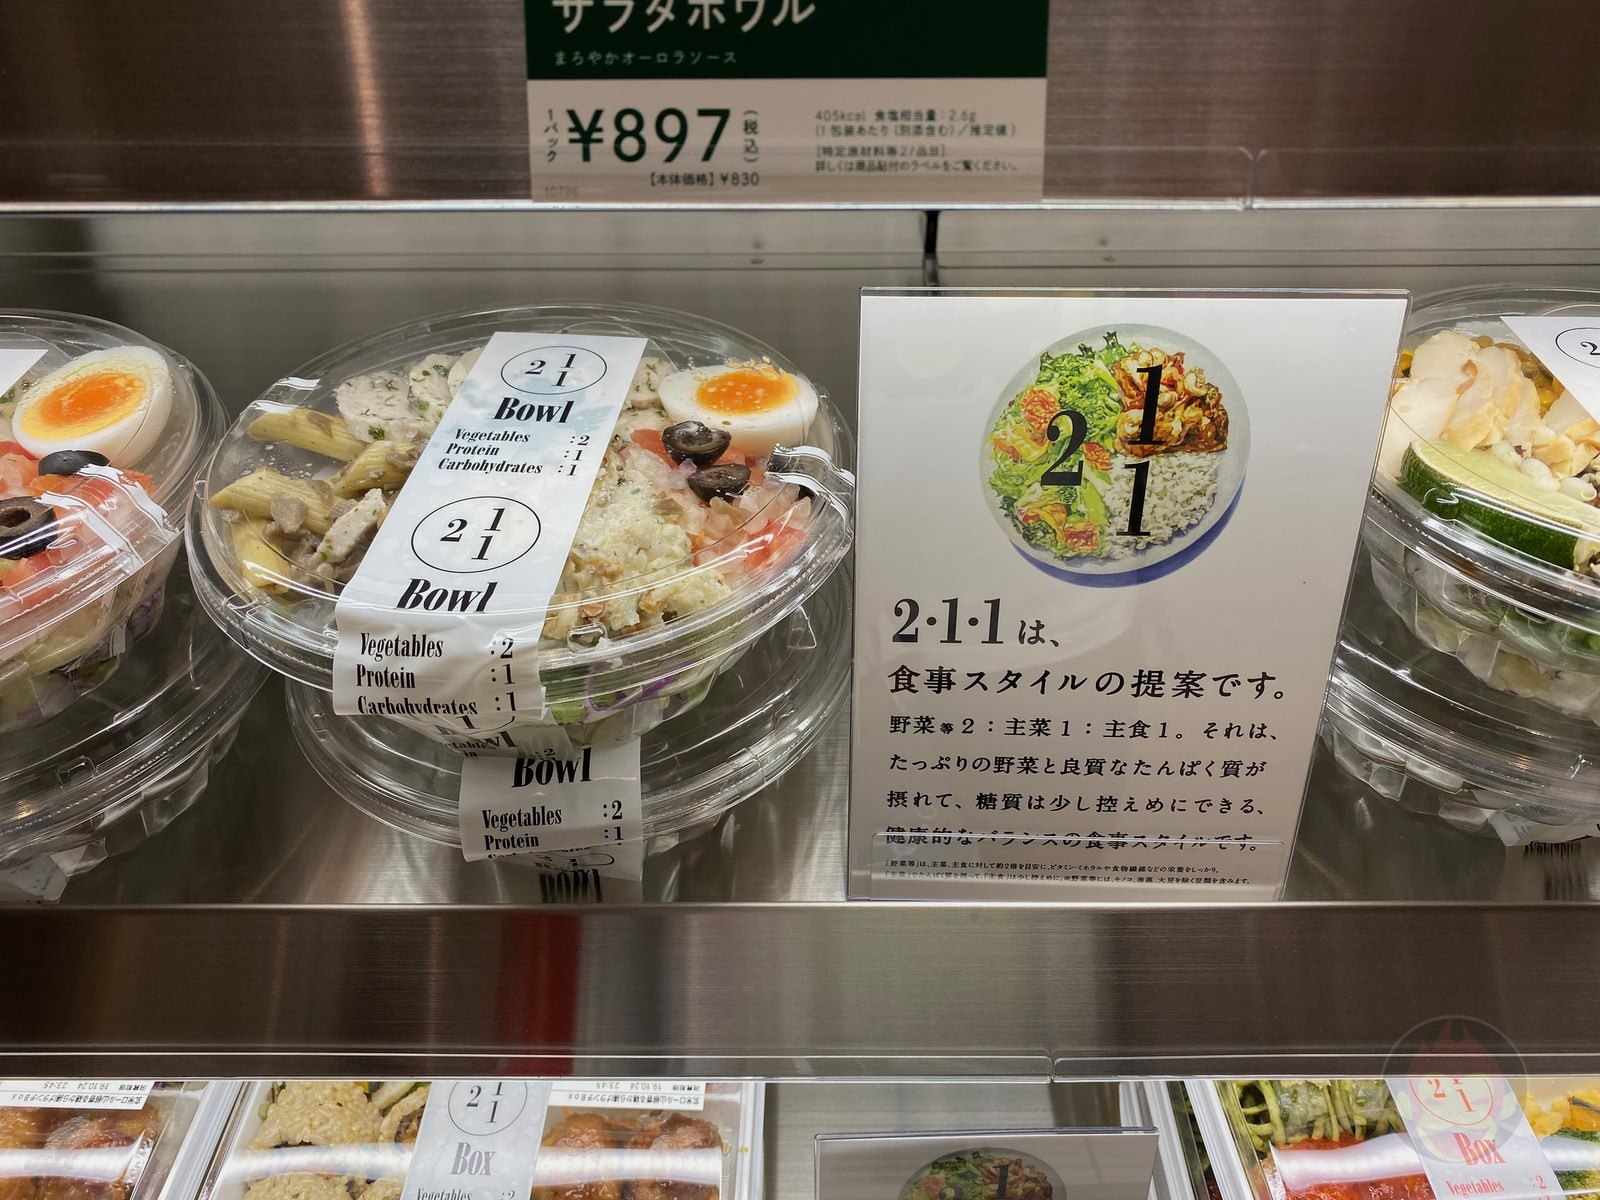 Shibuya-Scramble-Square-Food-I-Ate-134.jpeg